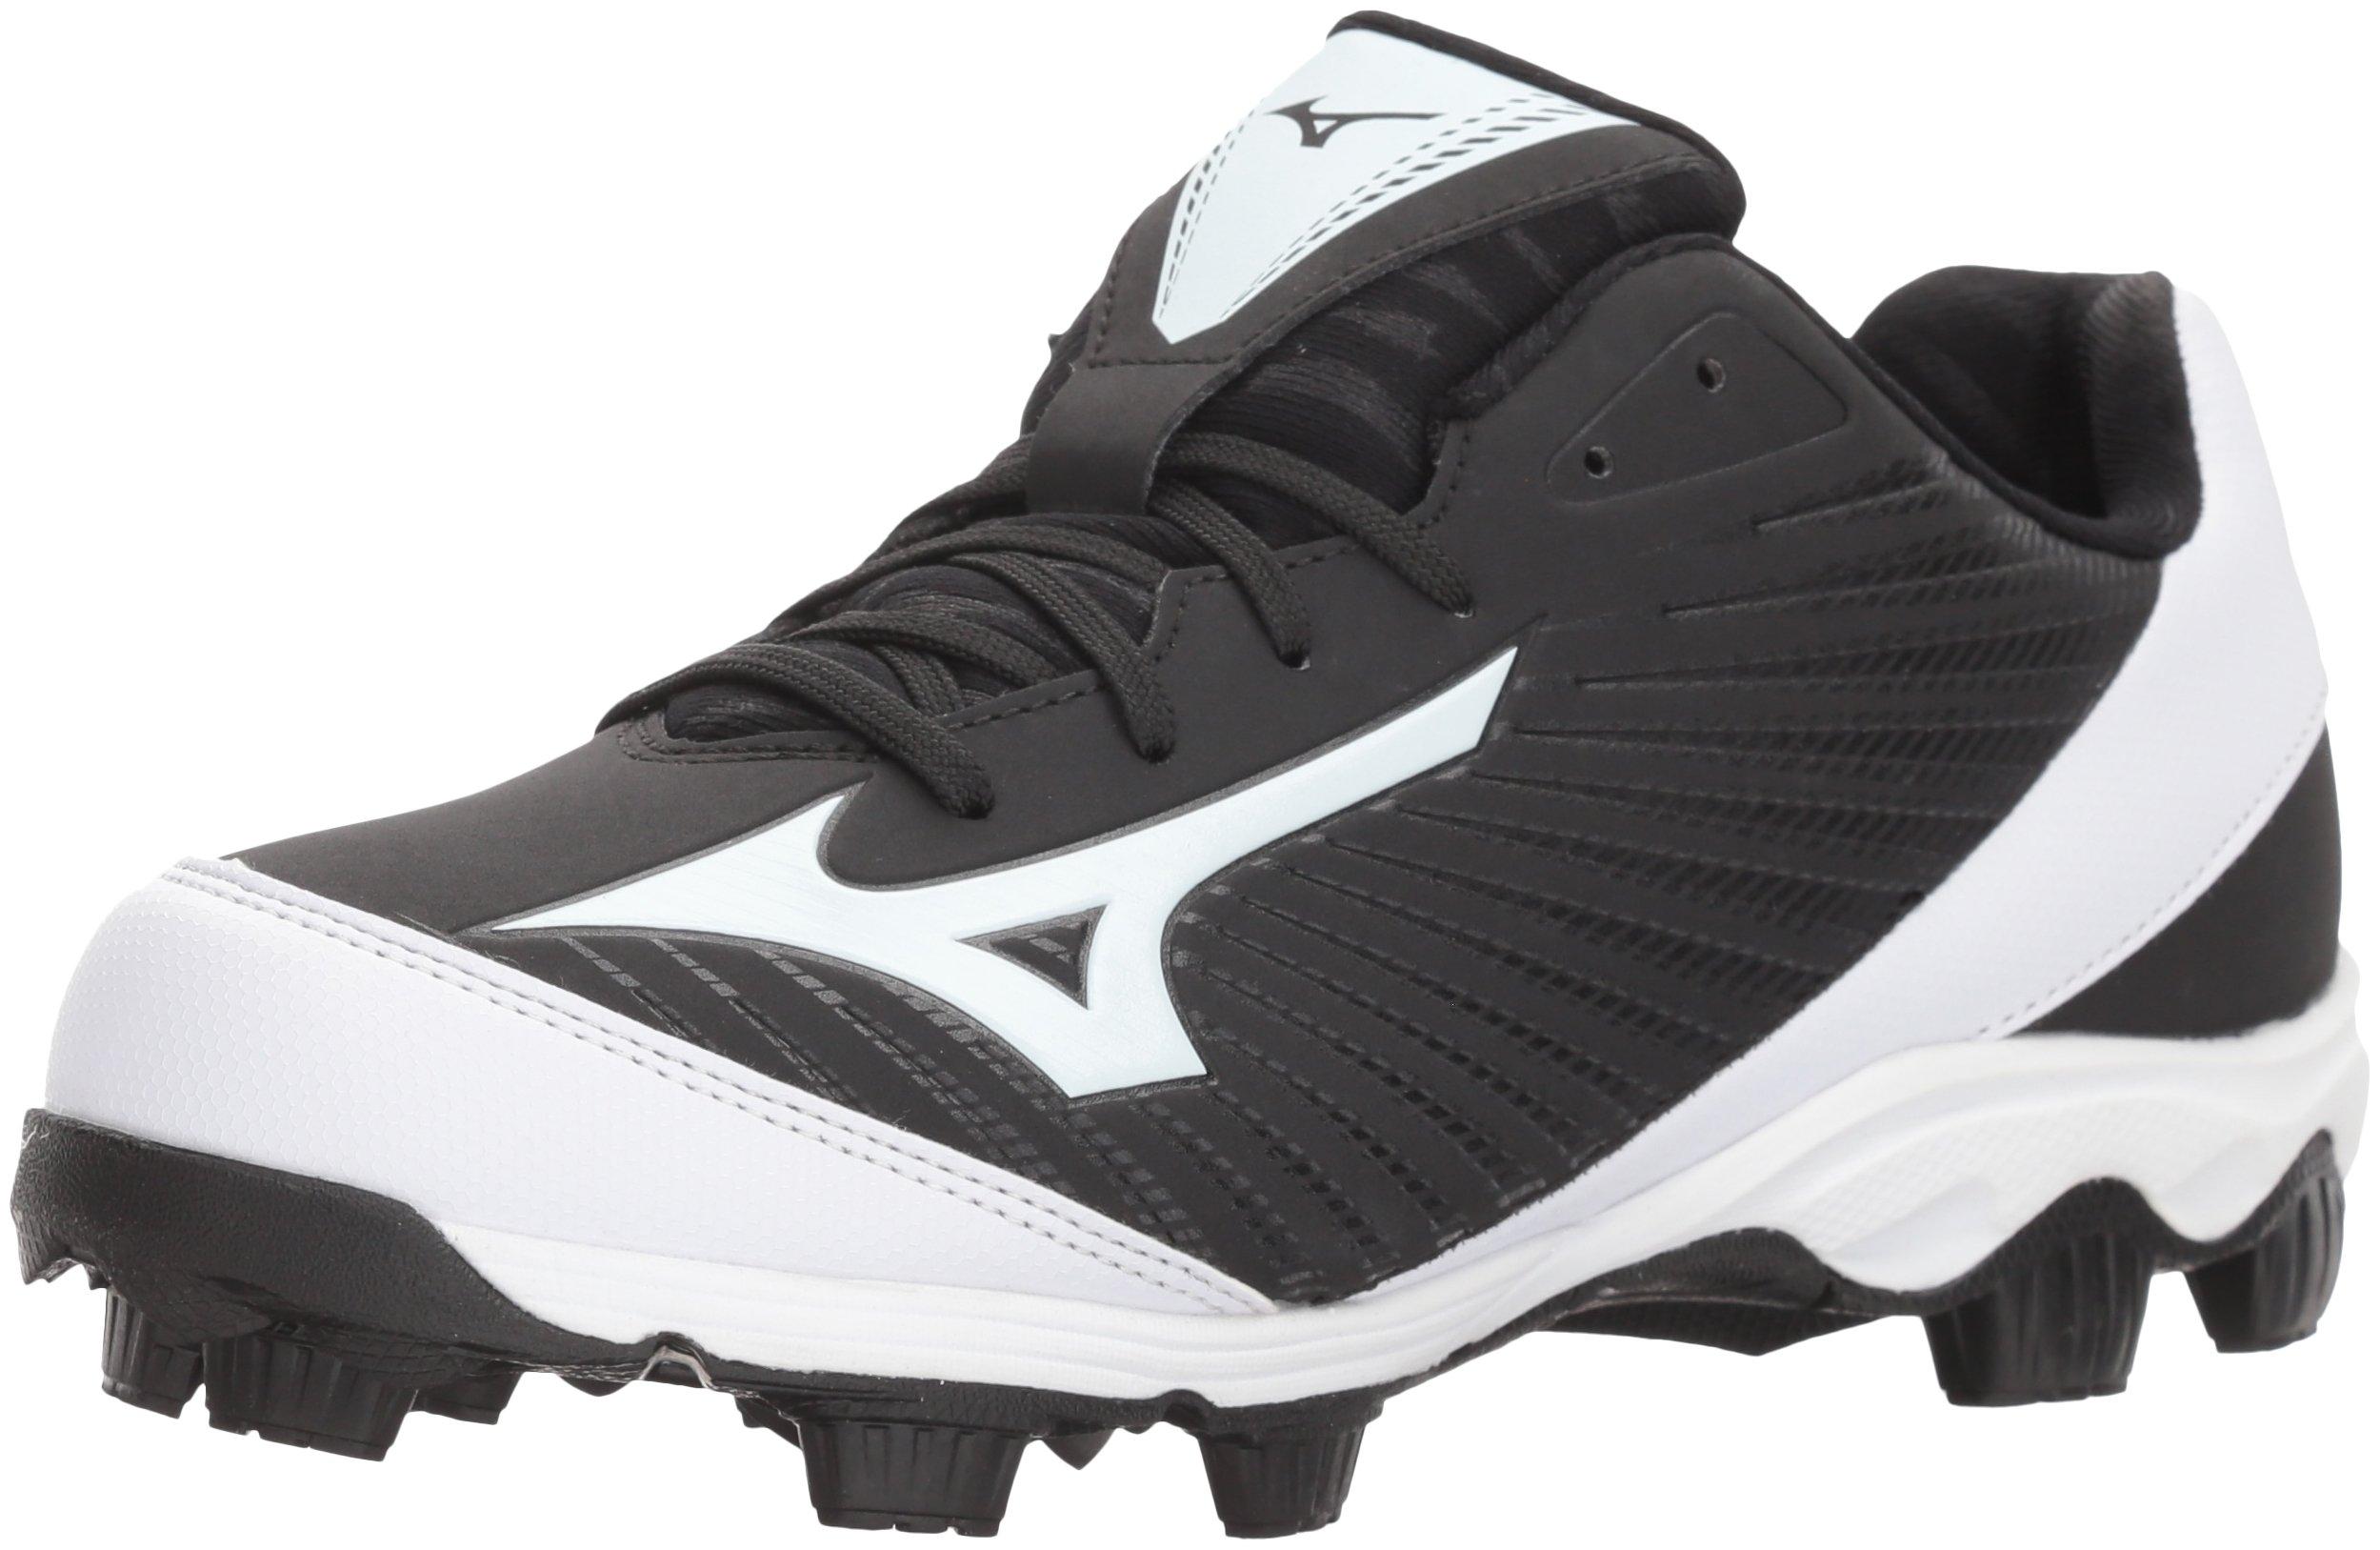 Mizuno (MIZD9)) Women's 9-Spike Advanced Finch Franchise 7 Fastpitch Cleat Softball Shoe, Black/White, 9.5 B US